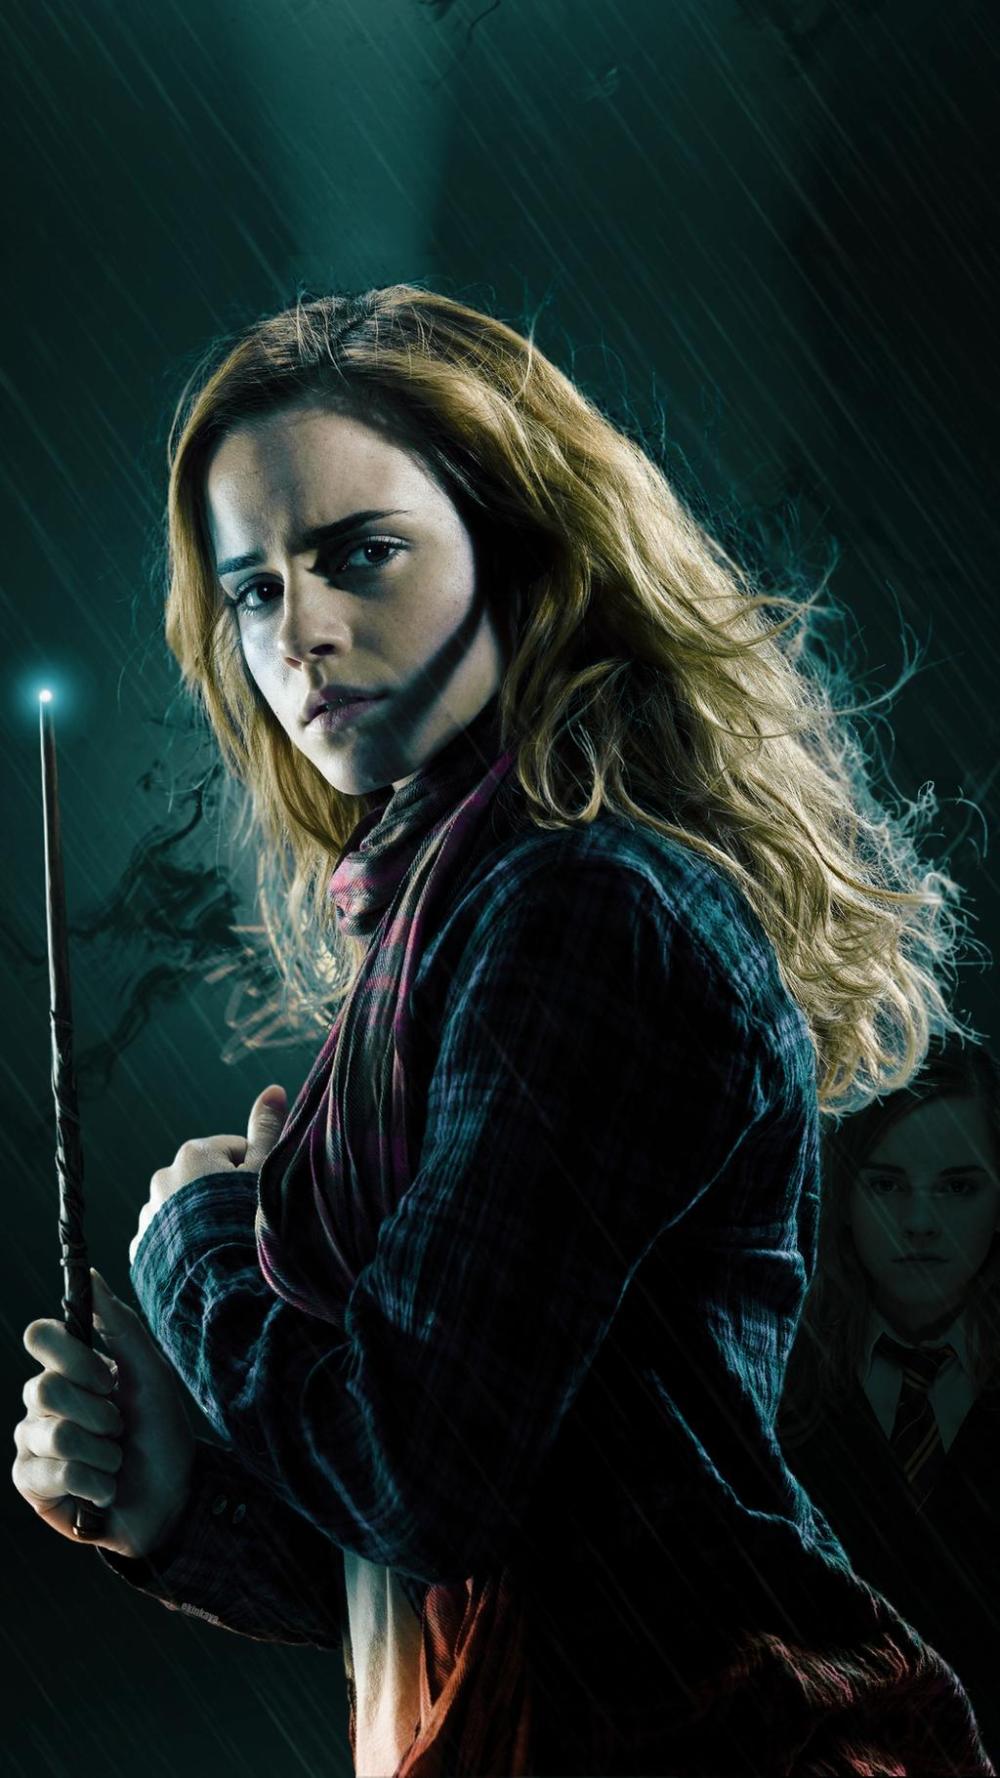 hermione granger wallpaper Google Tìm kiếm, 2020